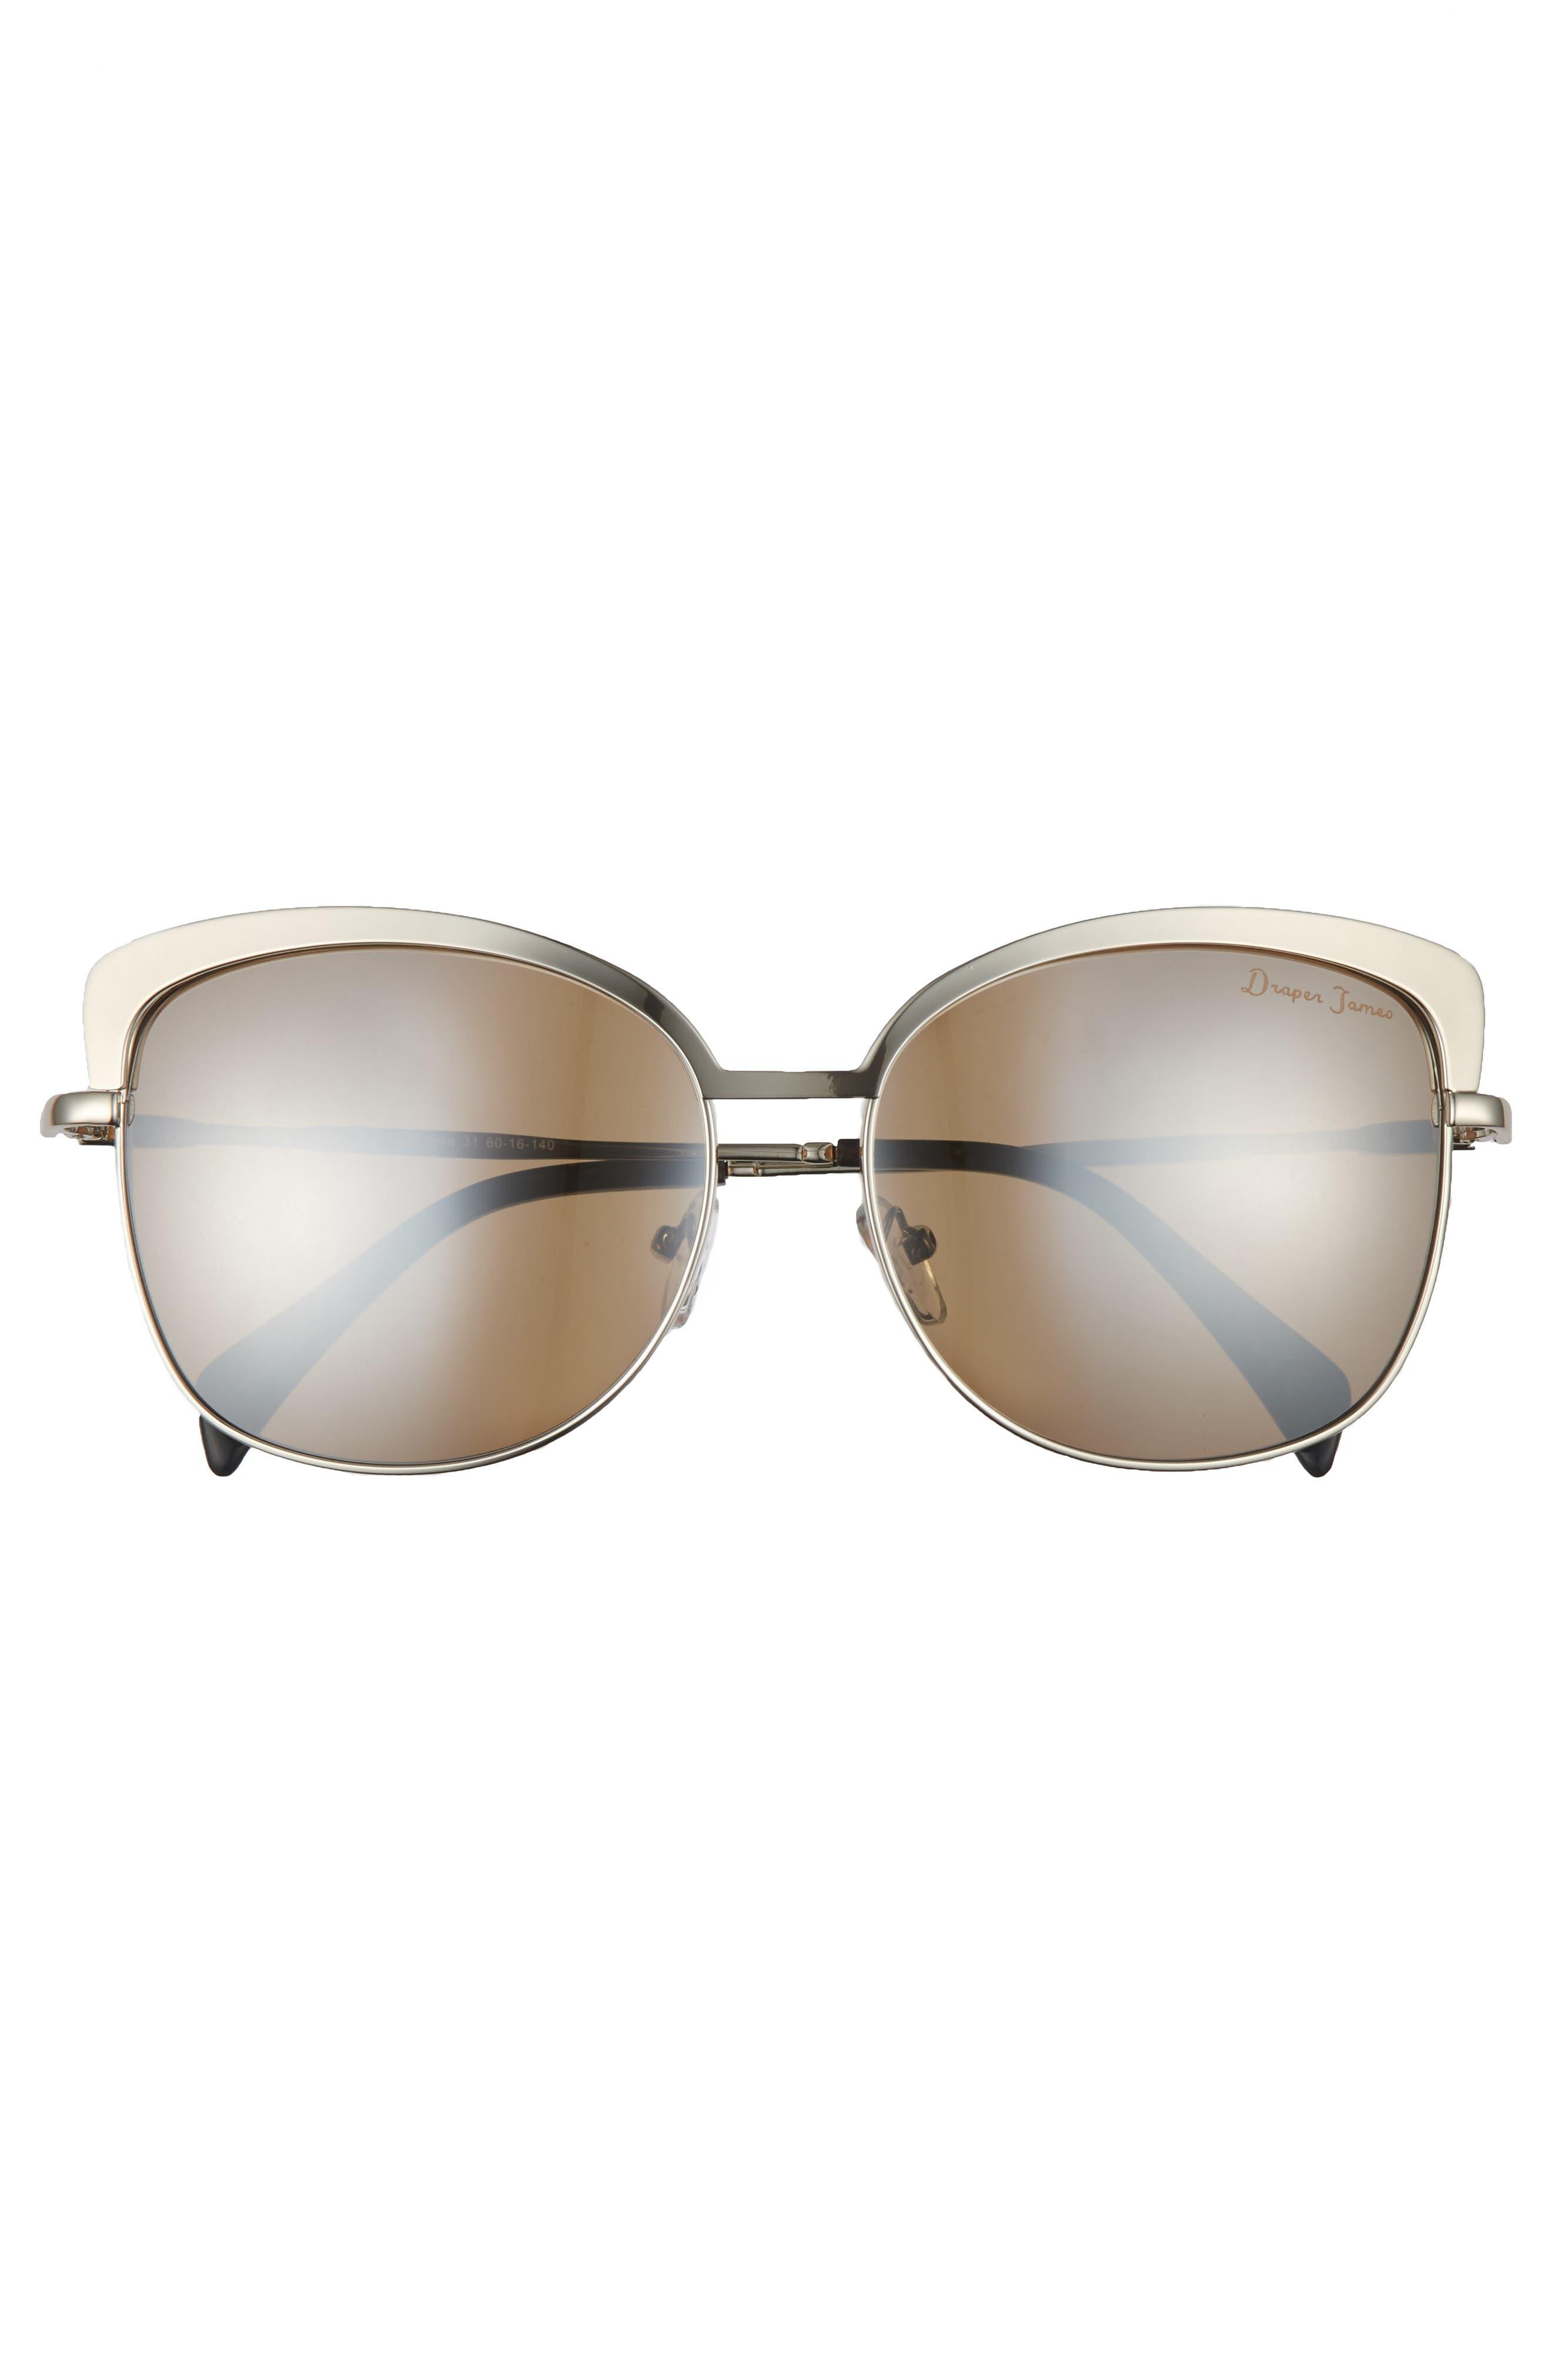 60mm Cat Eye Sunglasses,                             Alternate thumbnail 3, color,                             SHINY GUNMETAL